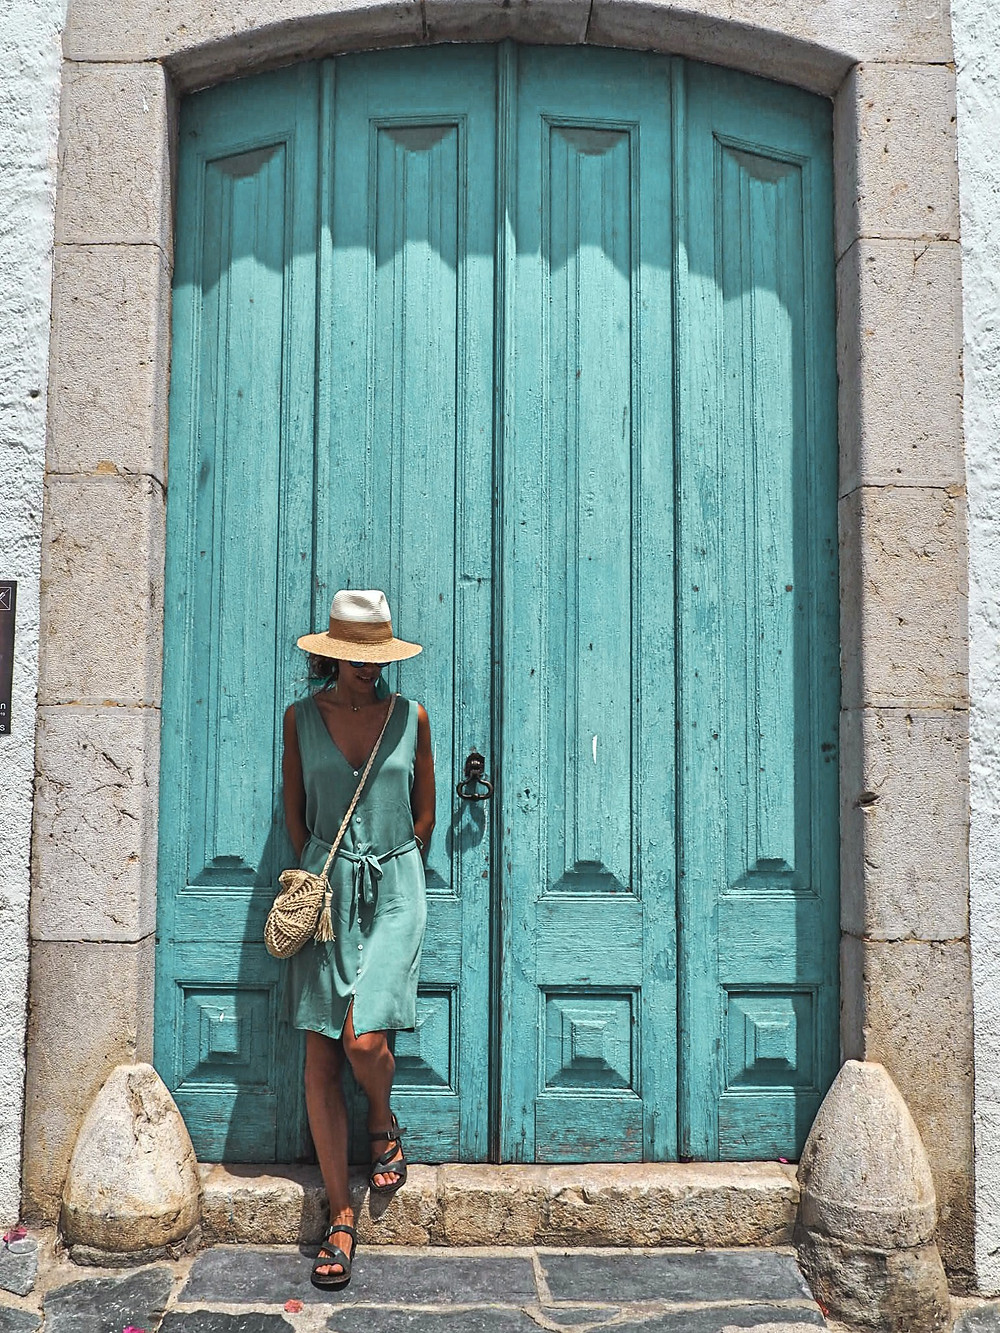 puerta, historias, misterio, azul, verano